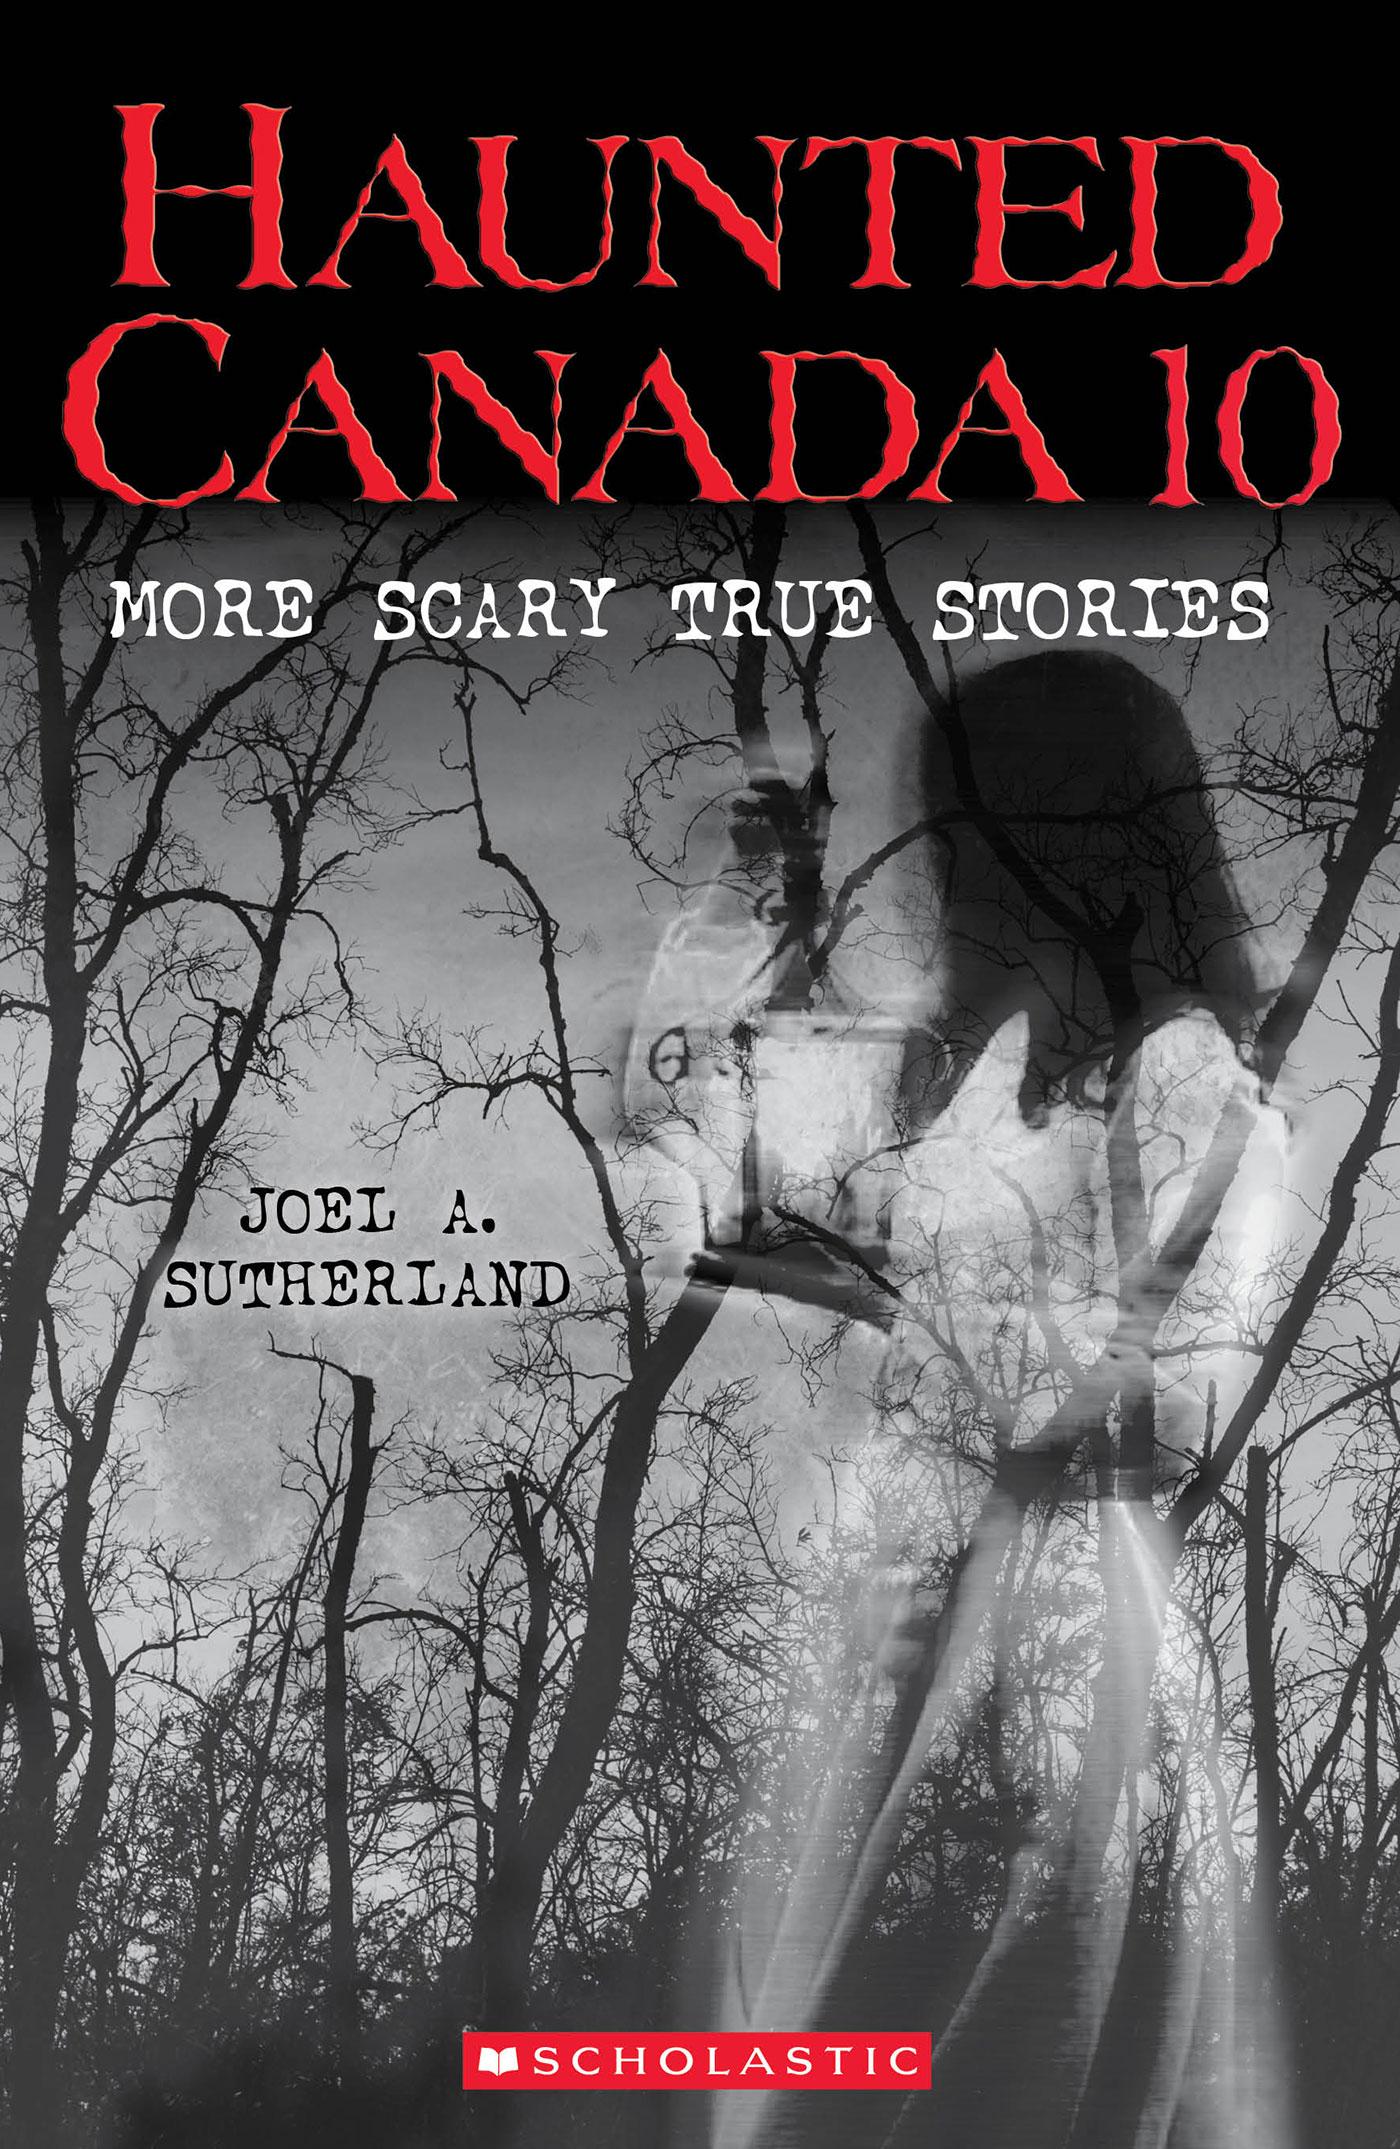 Cover Image of Haunted Canada 10 (Haunted Canada #10)